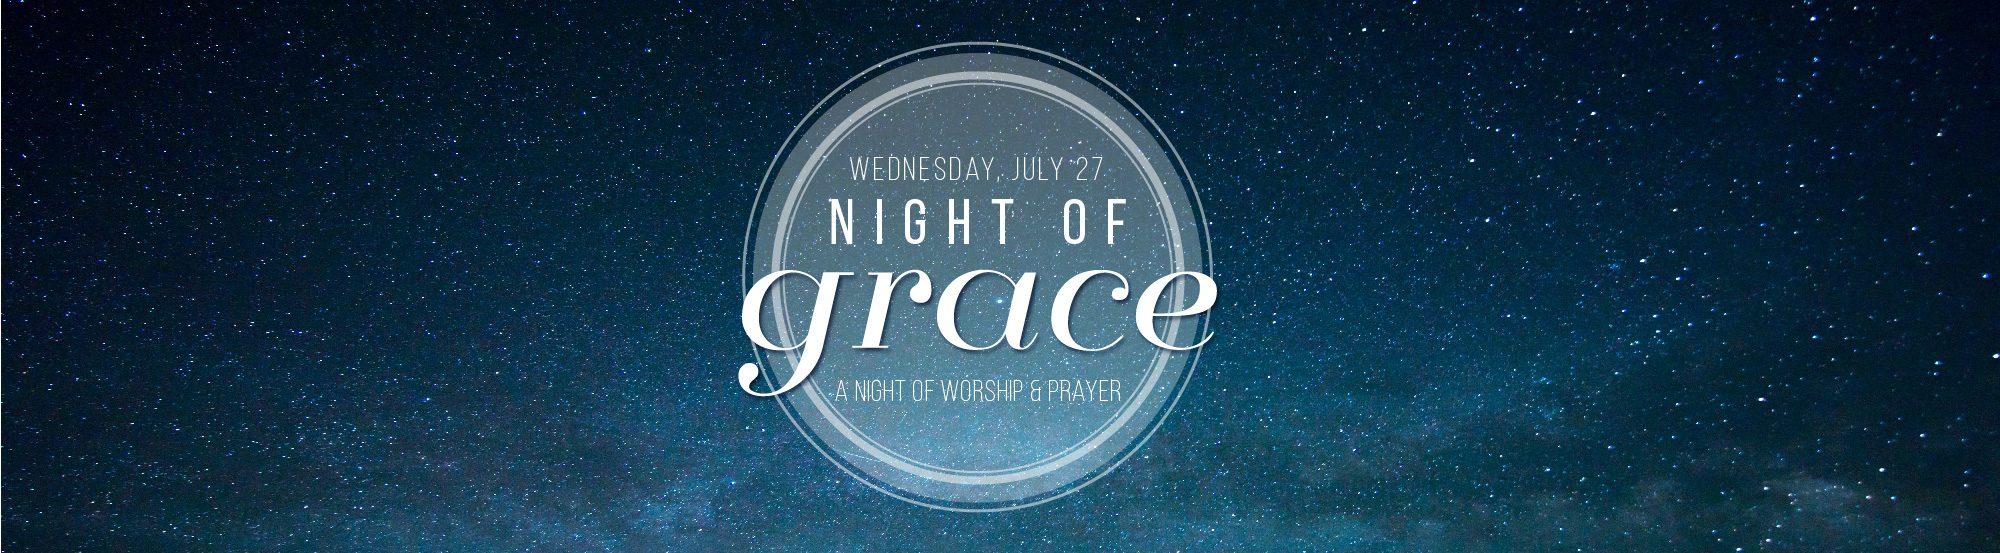 NightofGrace_2016_Website